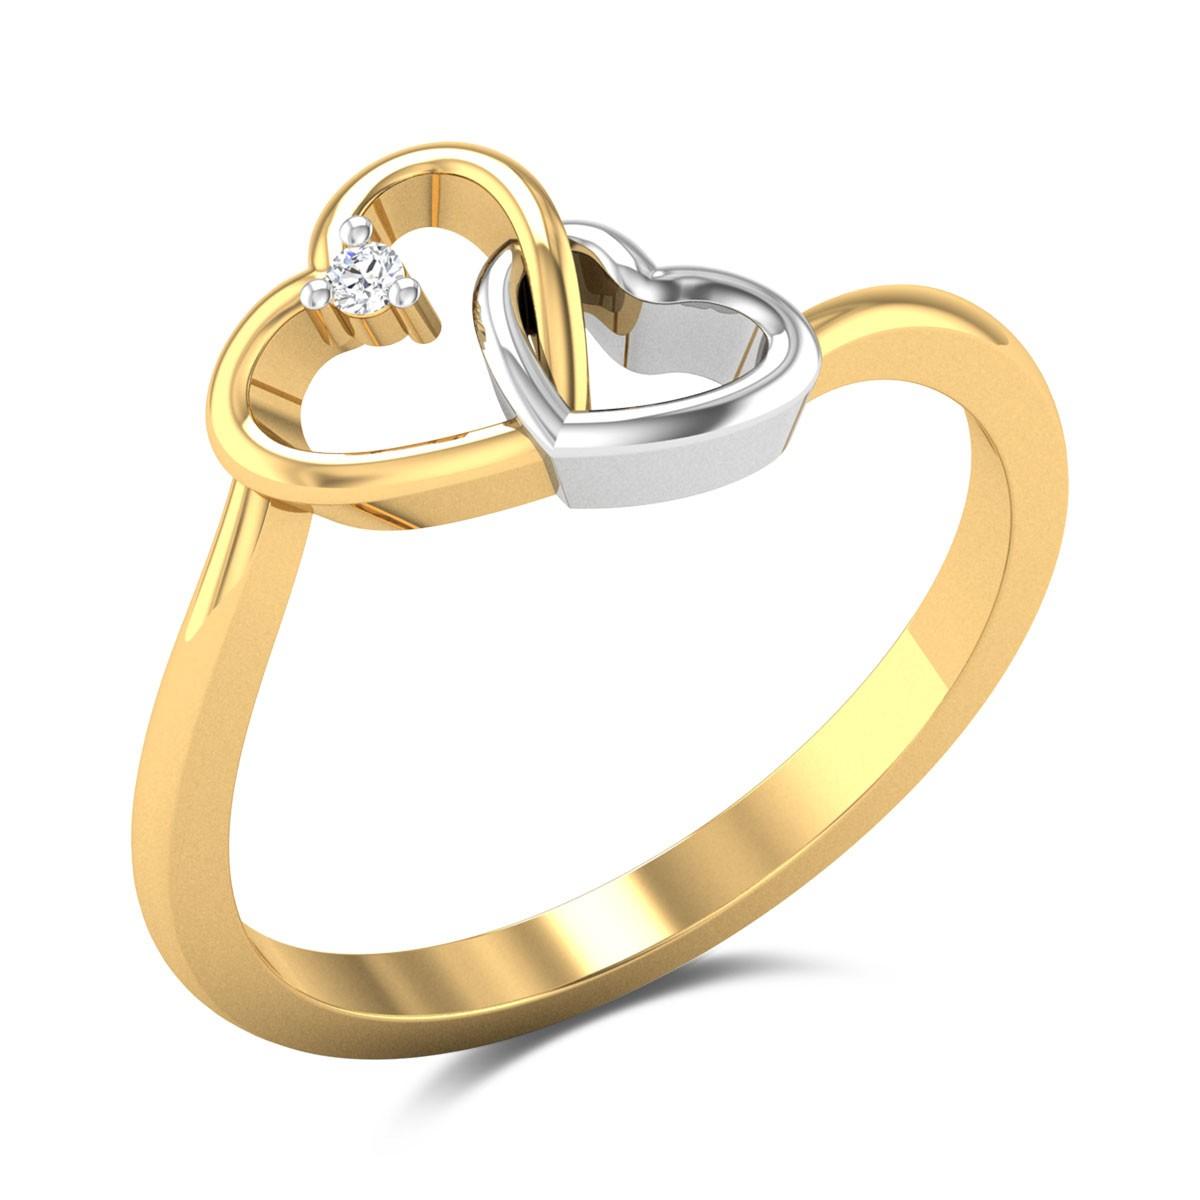 Blaine Diamond Ring